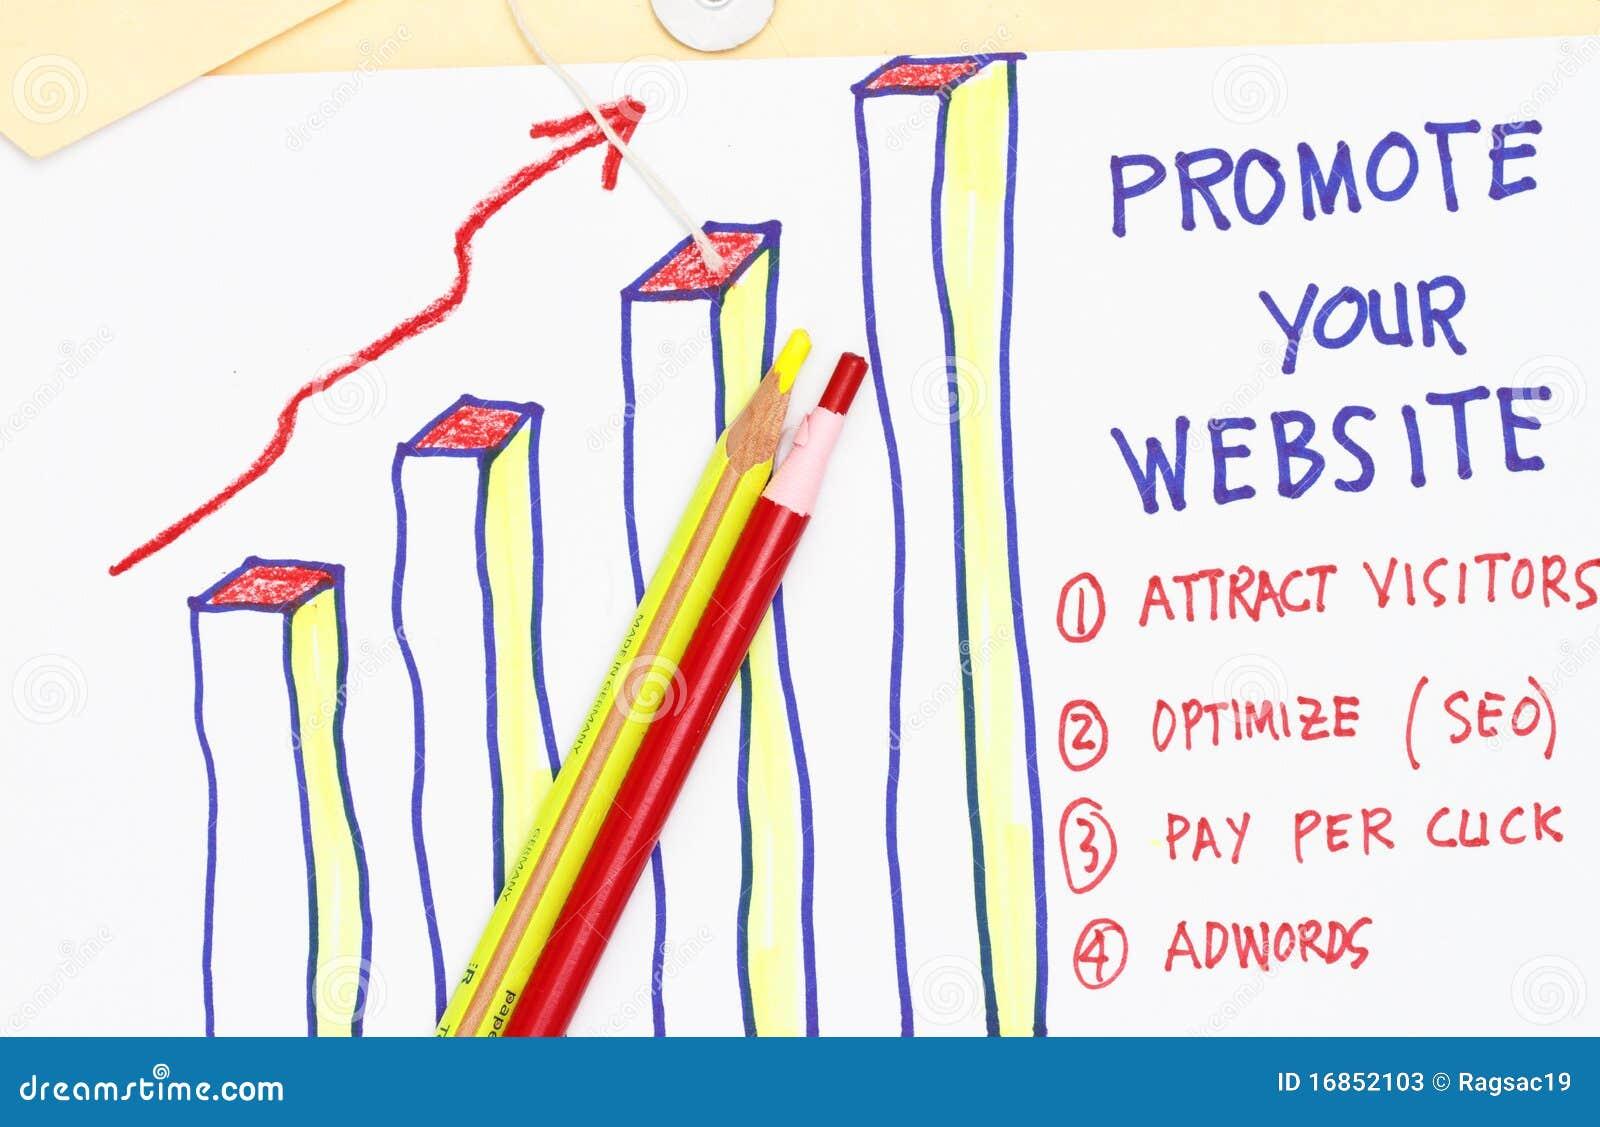 повысьте вебсайт ваш